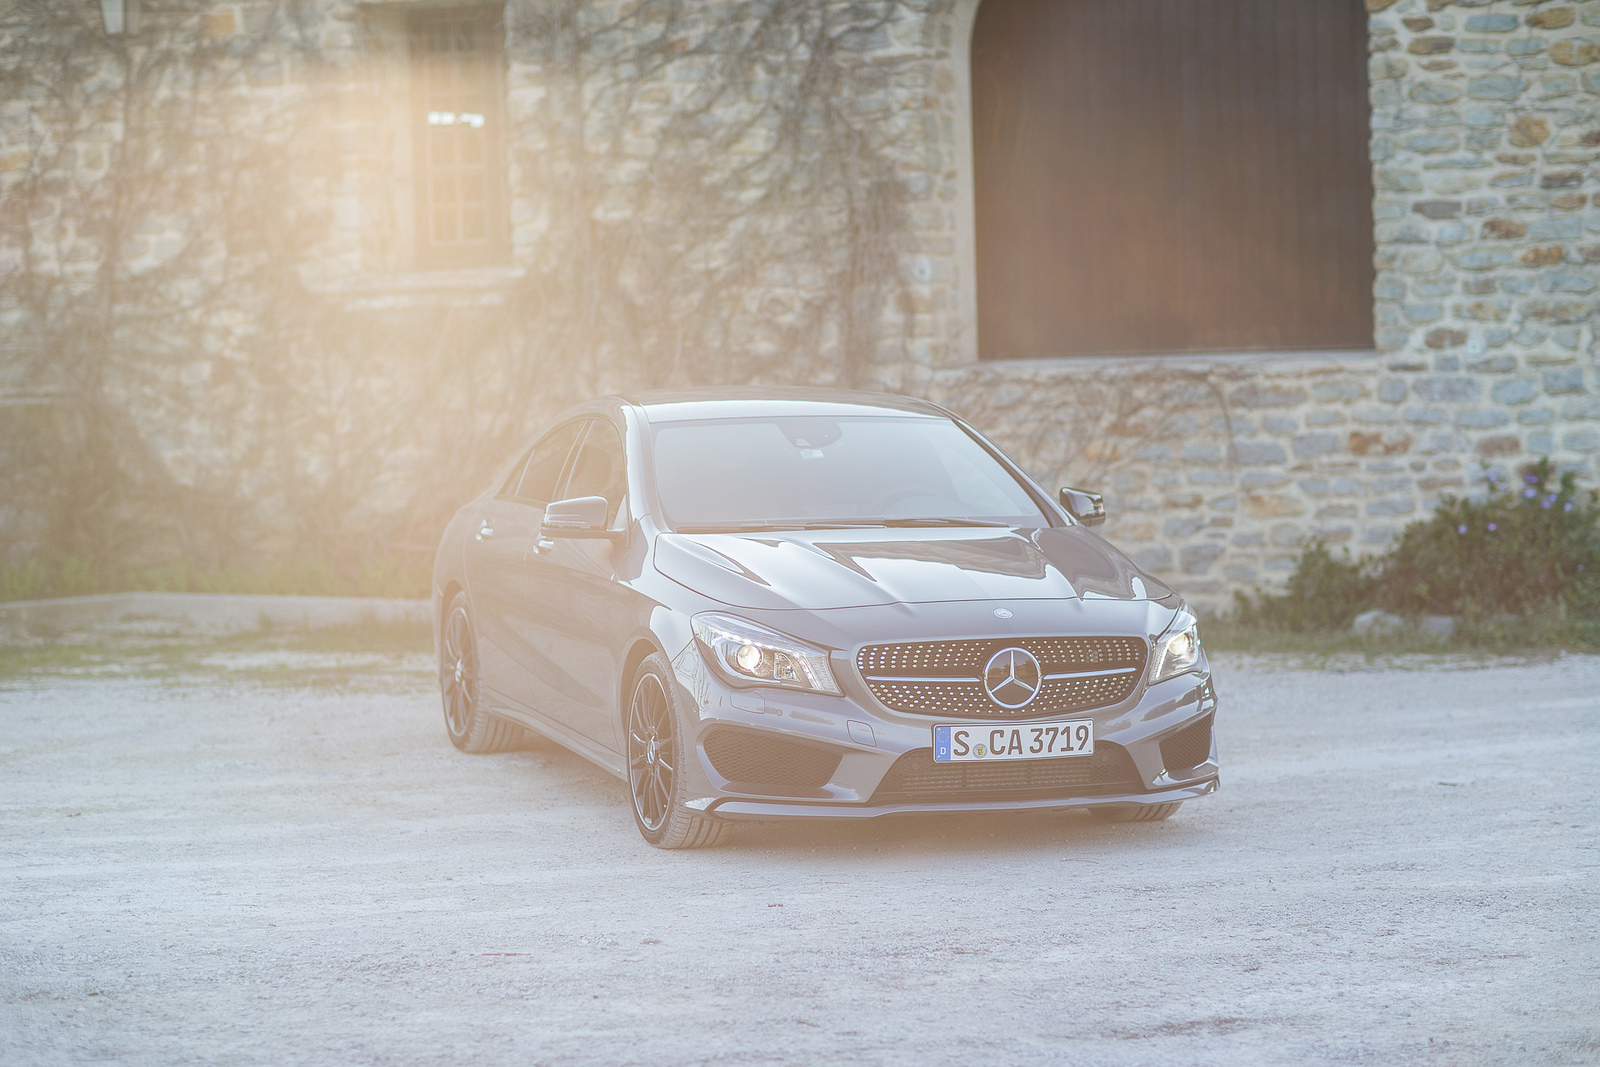 Mercedes-Benz CLA 200 drive-my тест драйв 2013